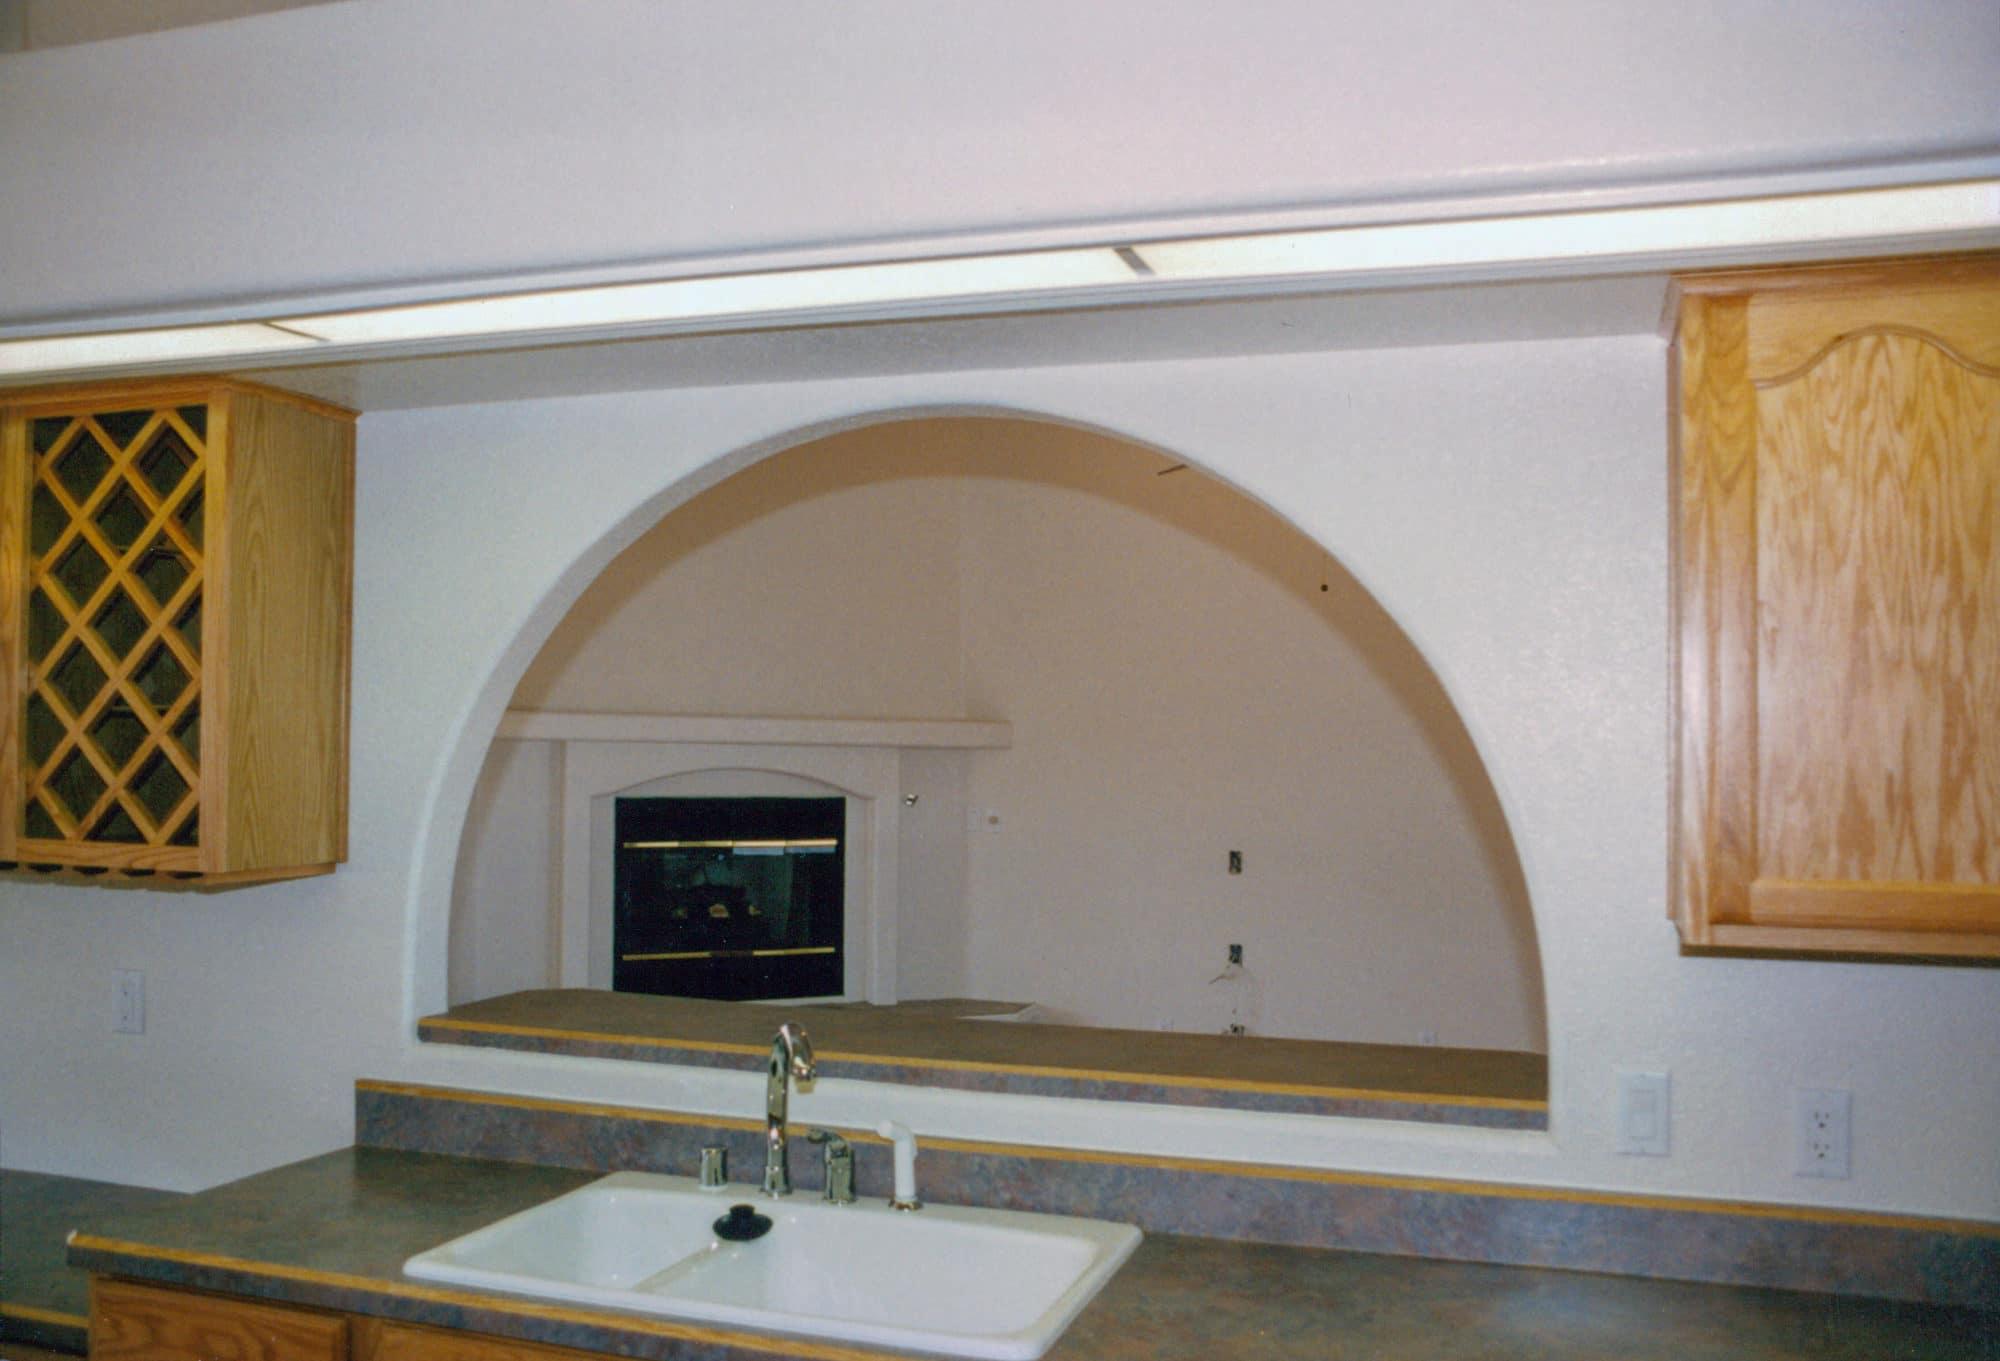 Sr Amp Hb Fireplaces 00000643 Sierra Remodeling